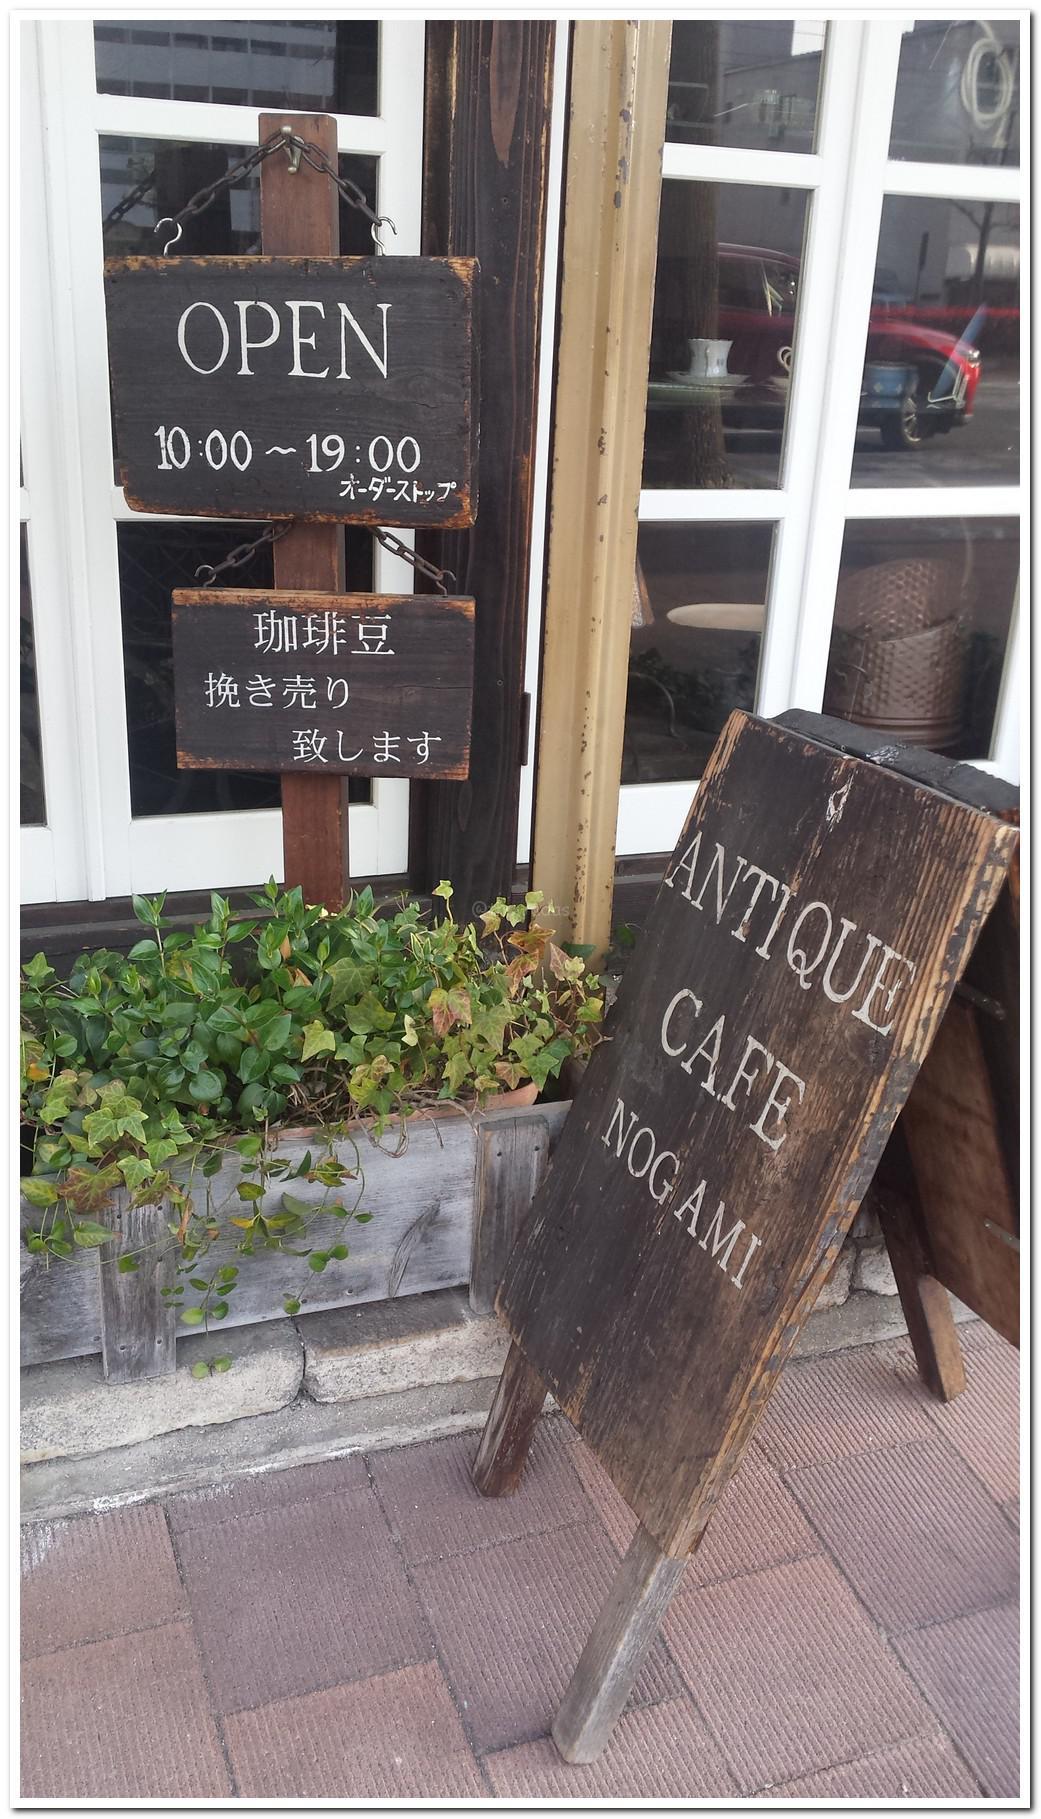 Nogami Antique Cafe on Momotaro Street (Okayama City)